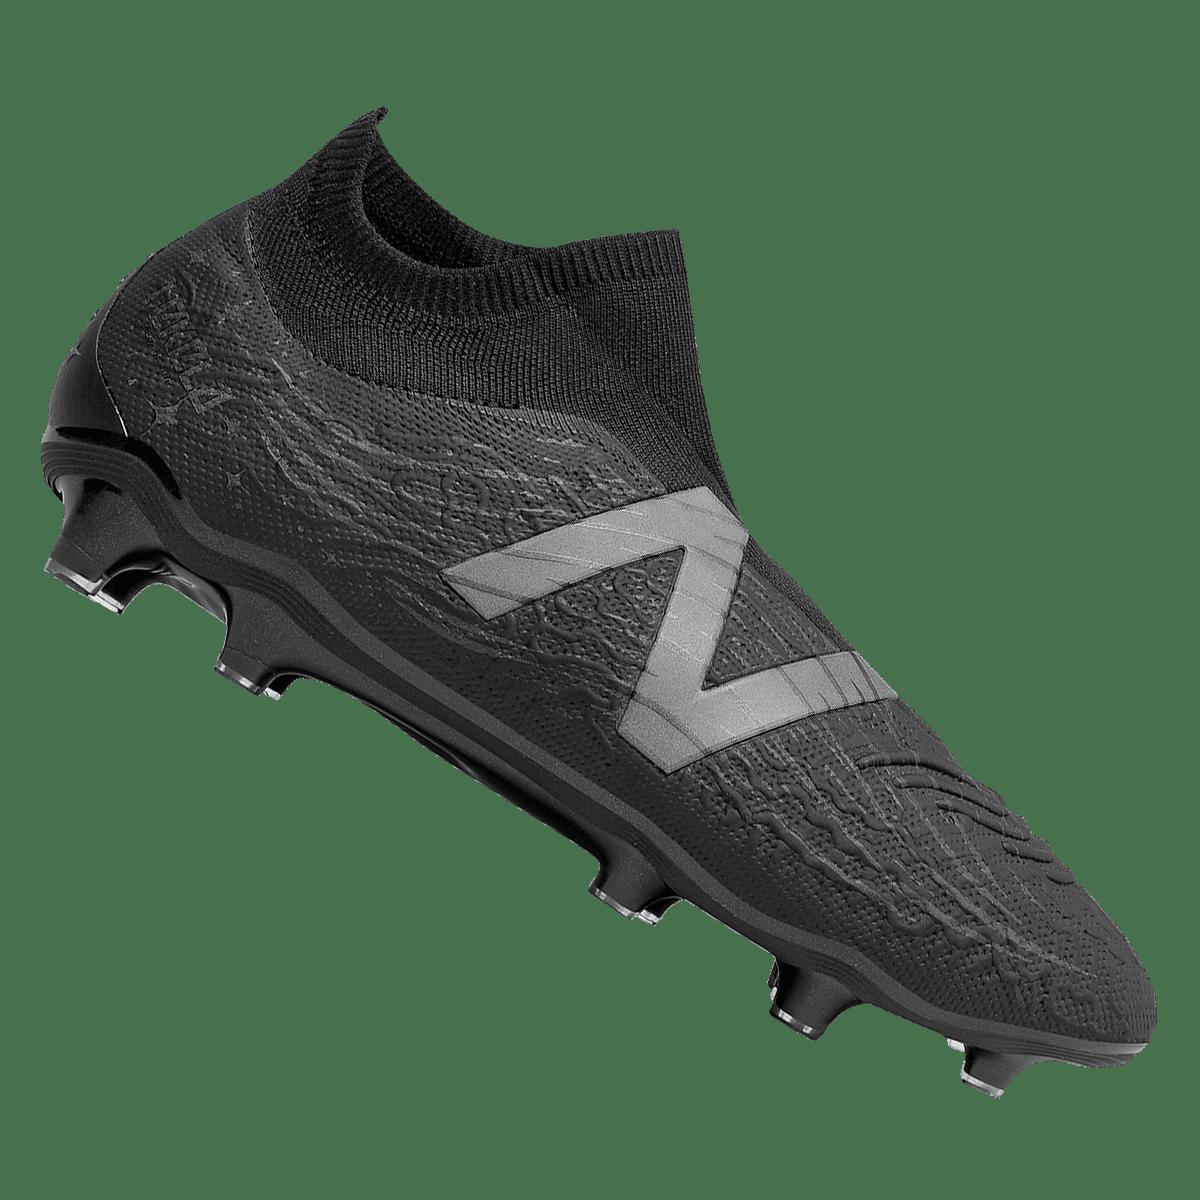 Chaussures de football New Balance Tekela v3 Pro FG Blackout noir/gris